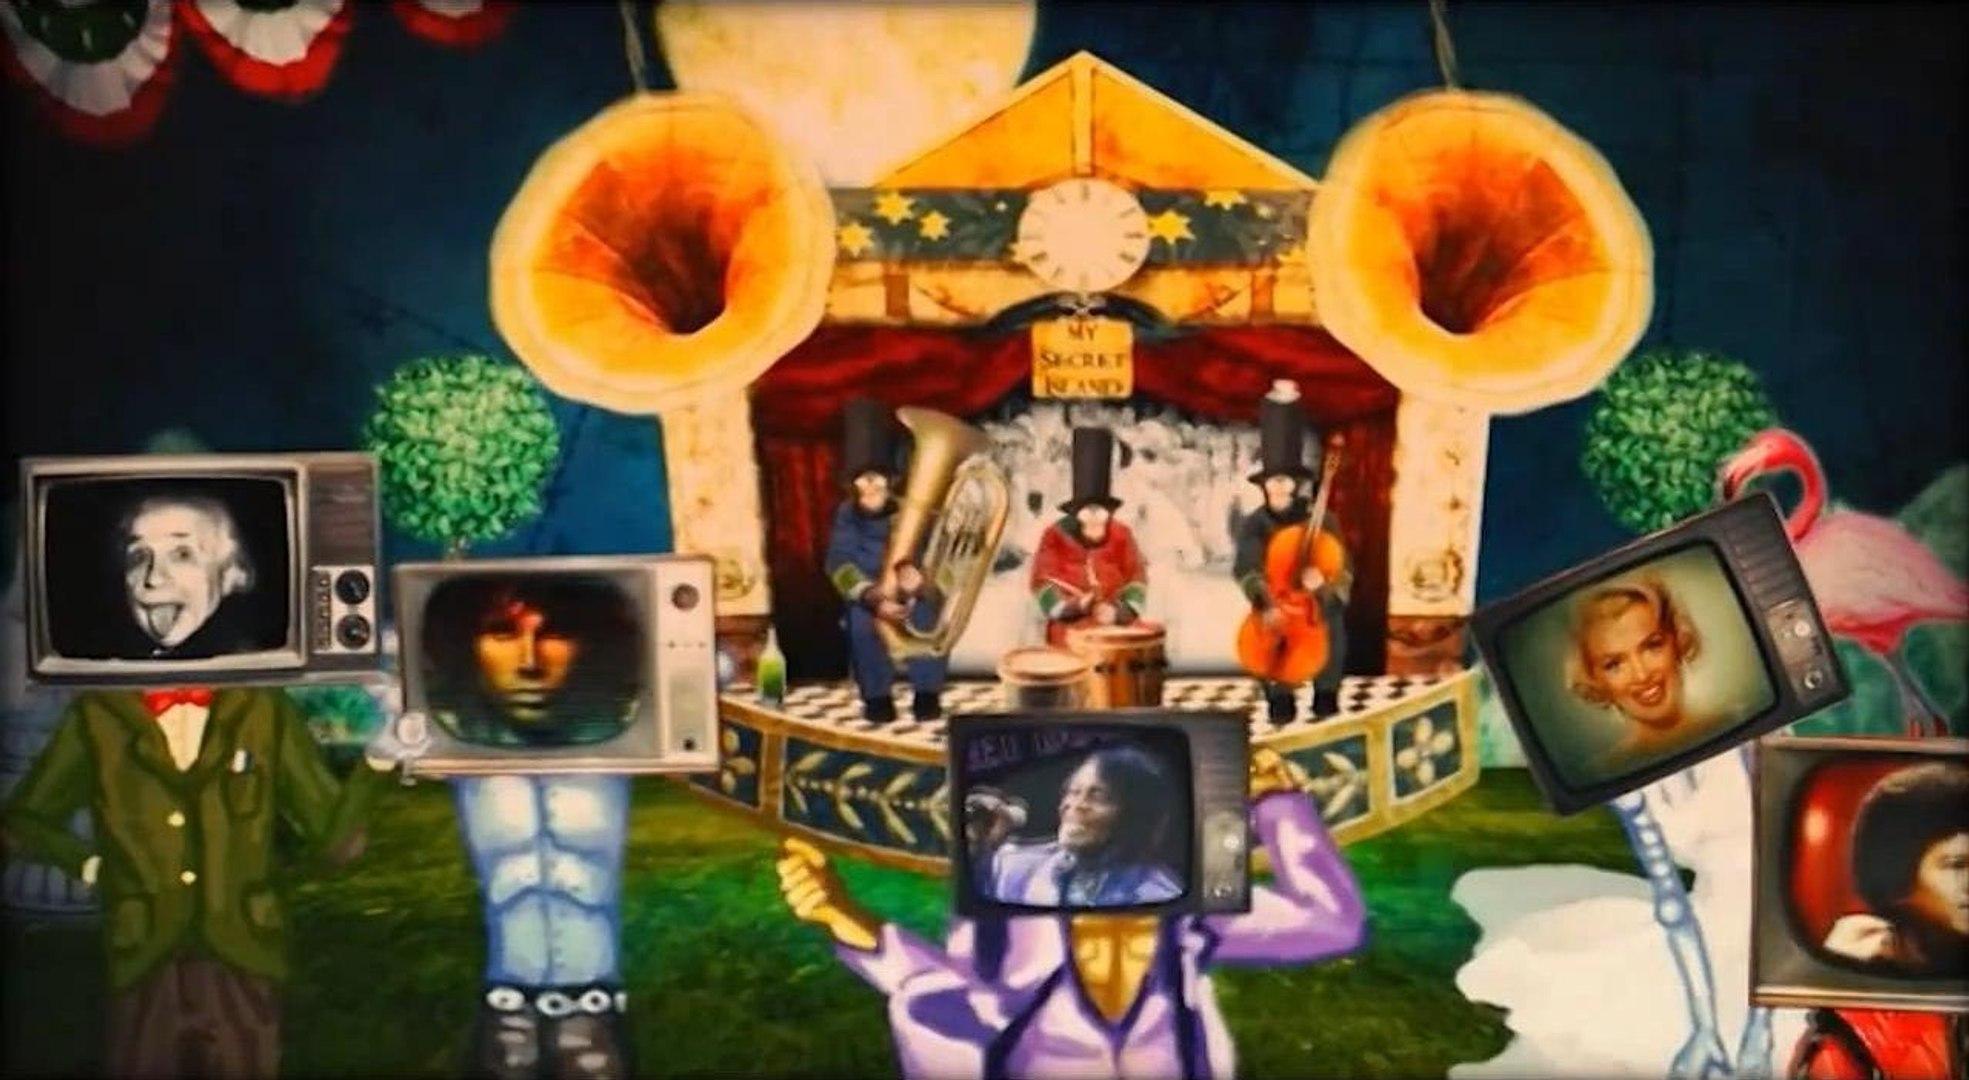 A SECRET PARTY with Jim Morrison, Elvis Presley, Michael Jackson and other dead celebrities / news